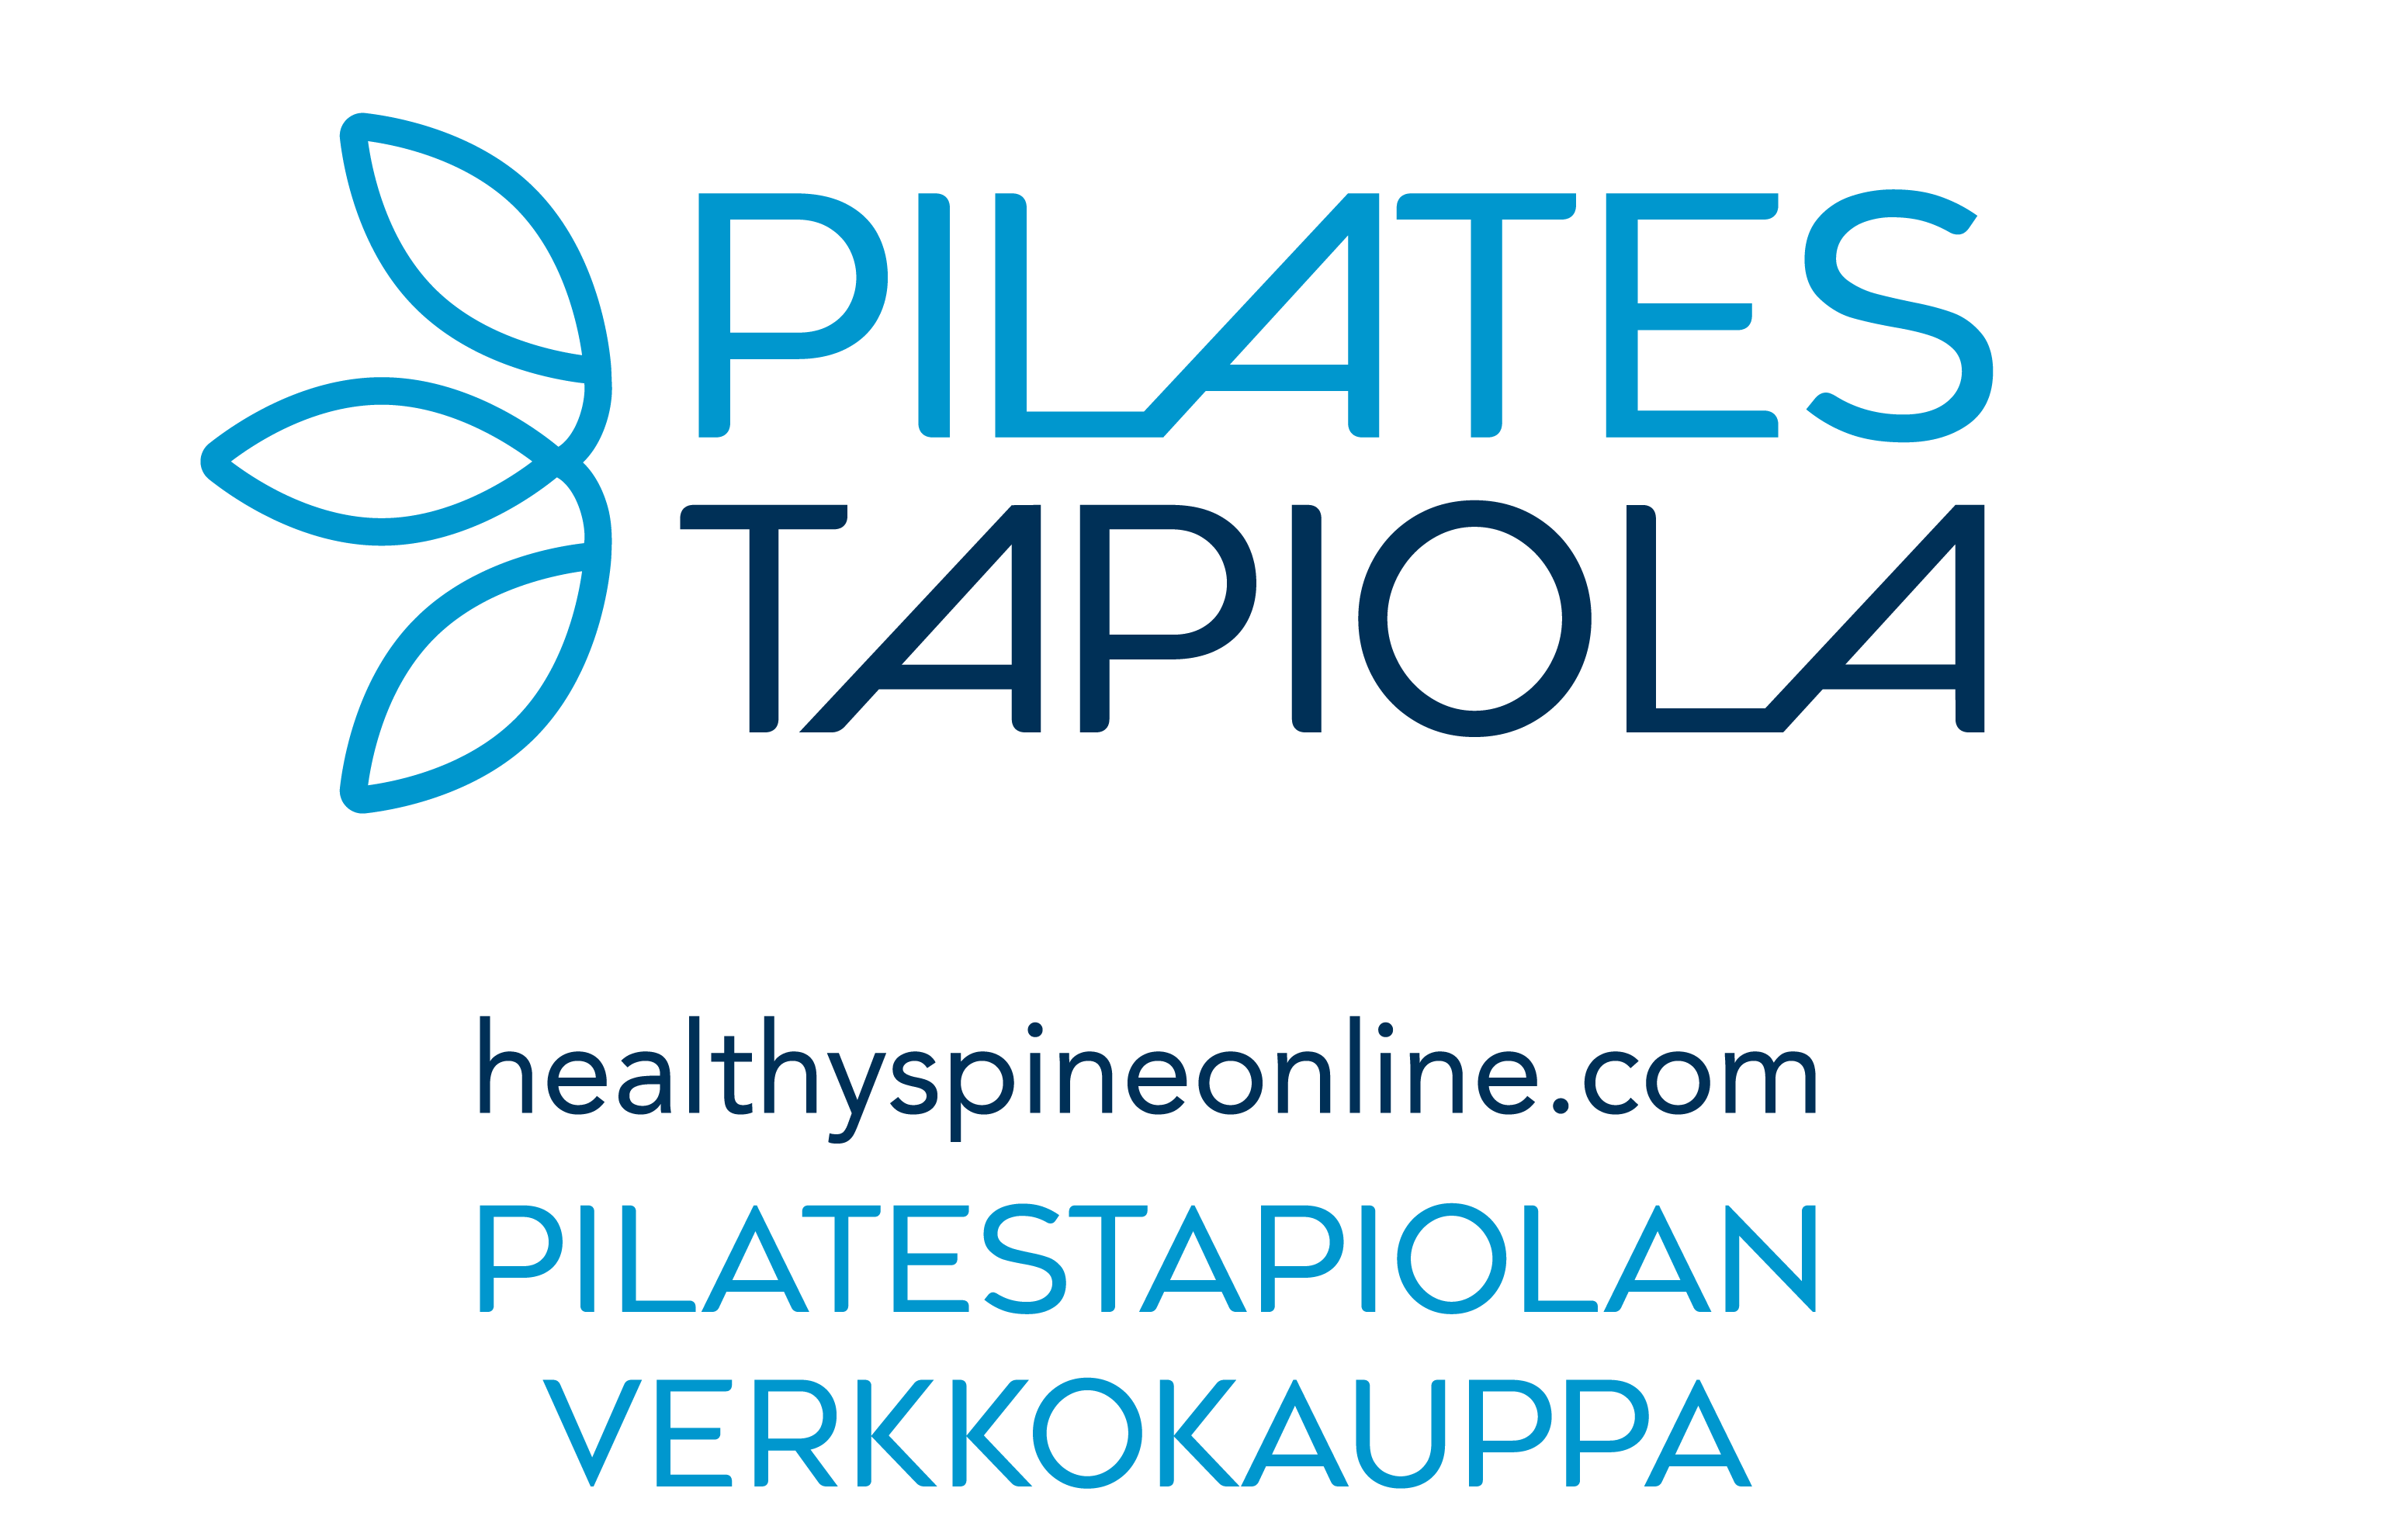 HealthySpineOnline